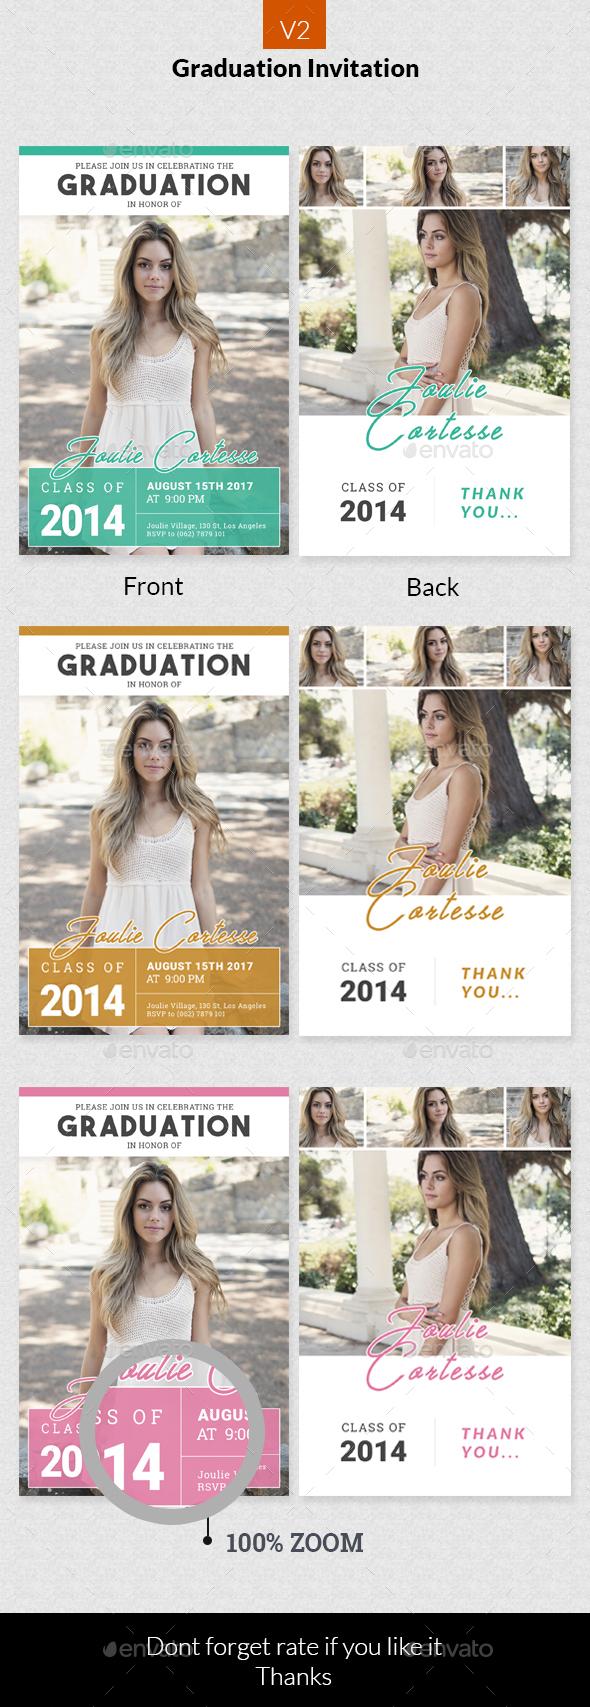 Graduation Invitation v2 - Invitations Cards & Invites